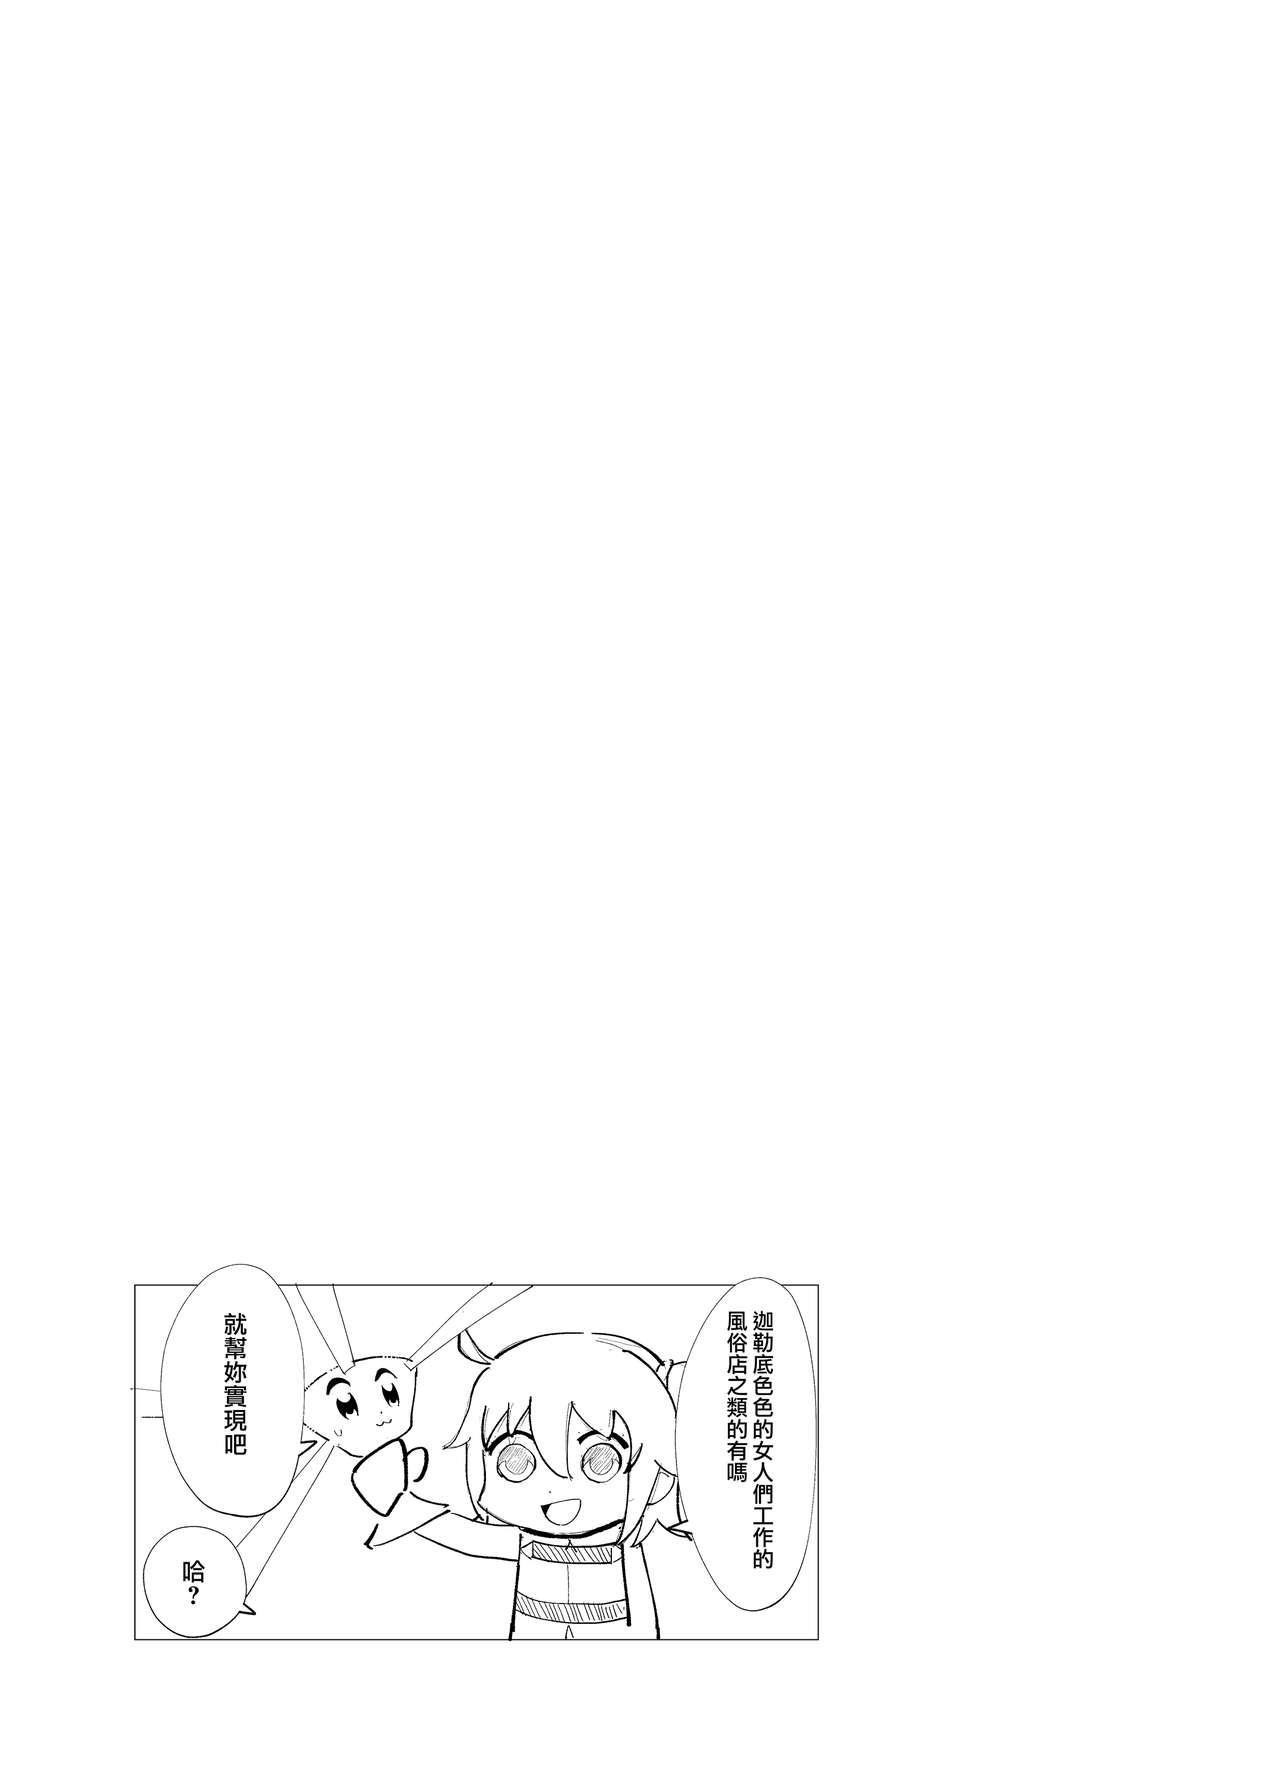 Chaldea Soap Book Kono Servant de Onegaishimasu 2